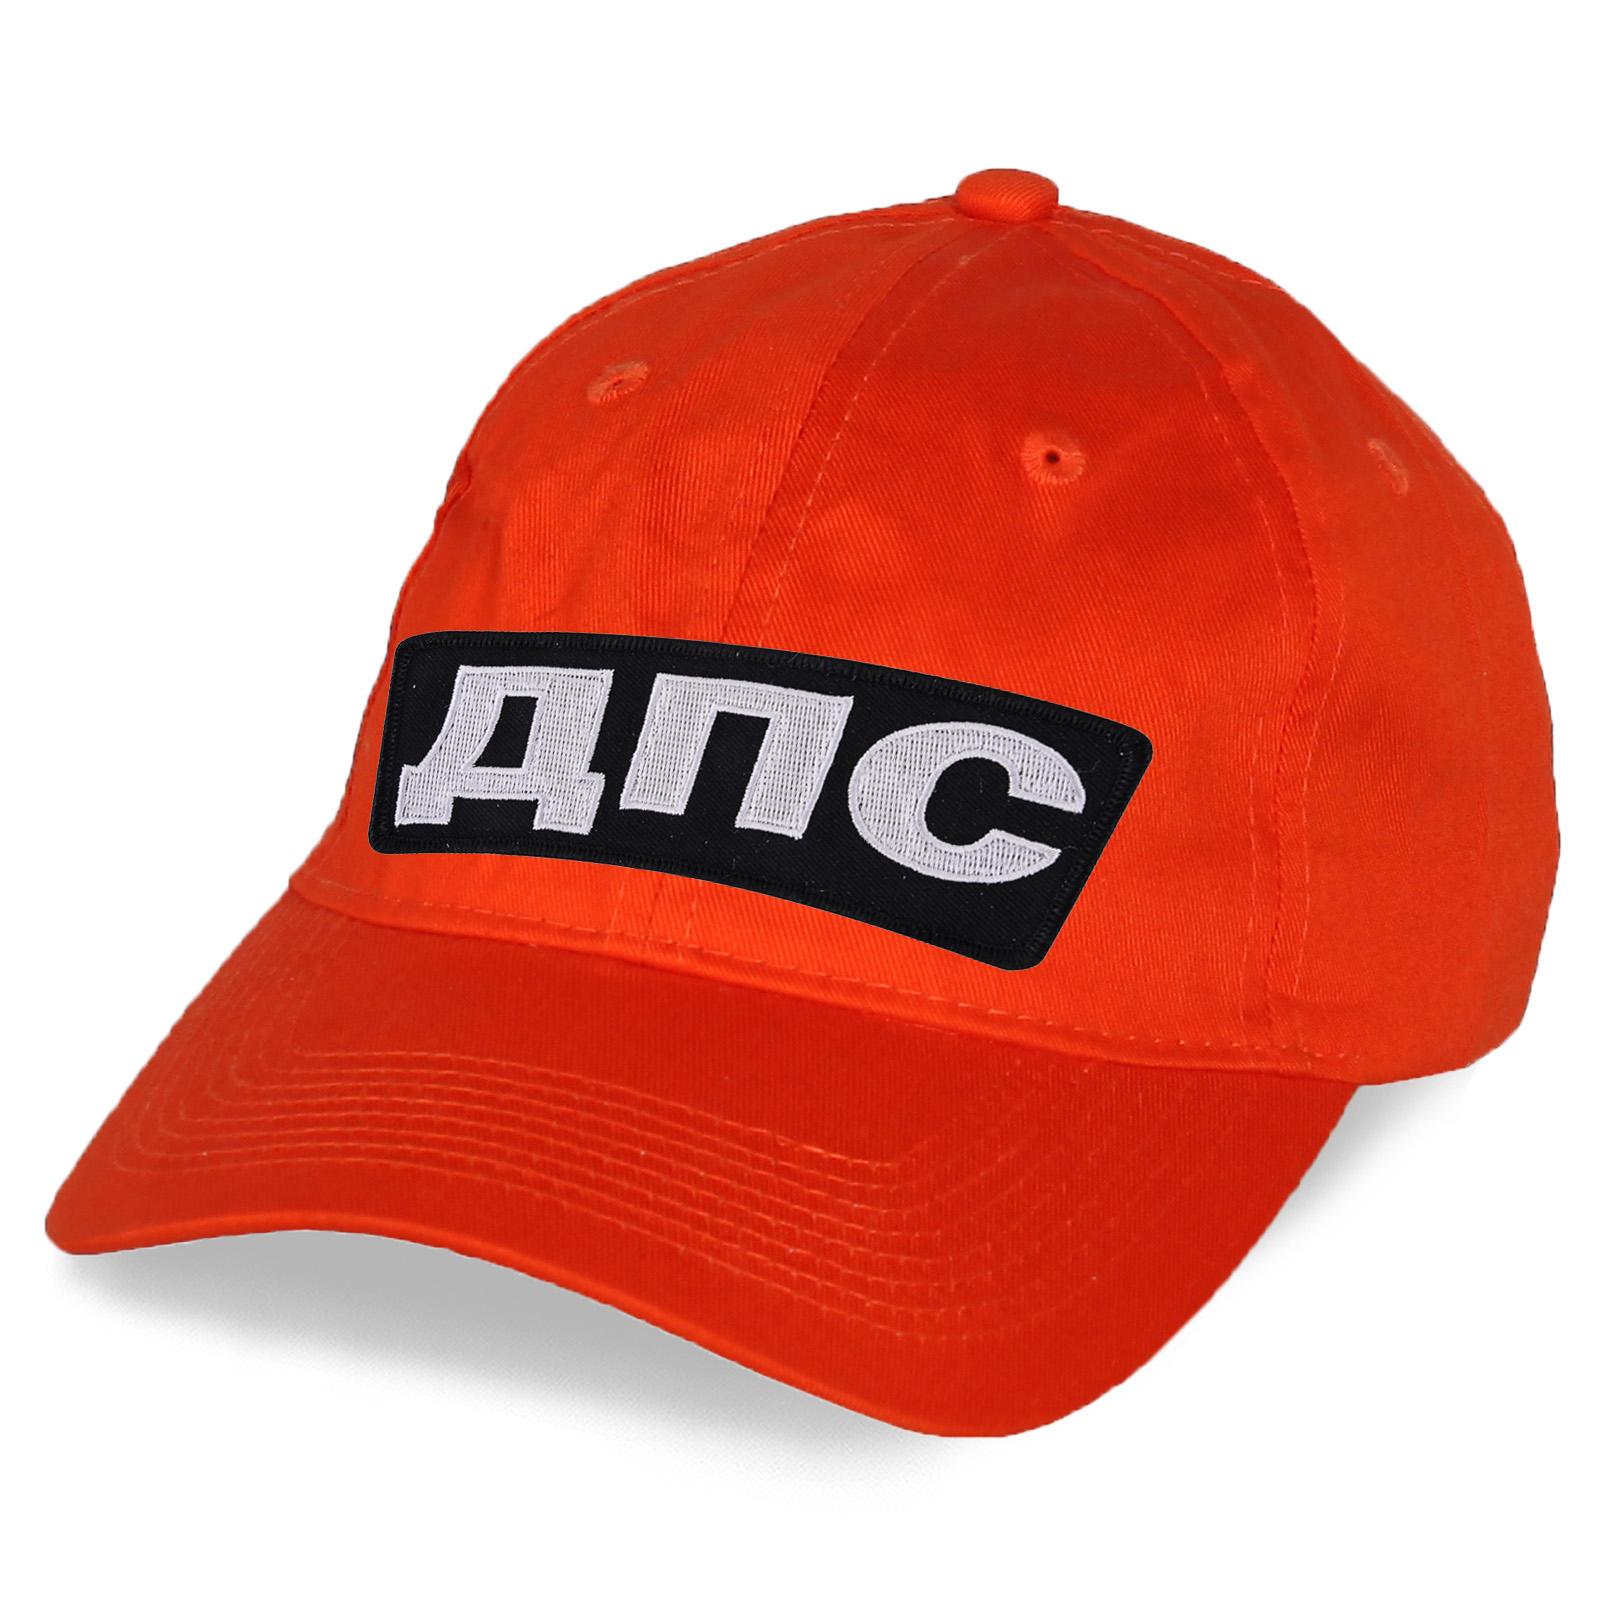 Оранжевая кепка ДПС.